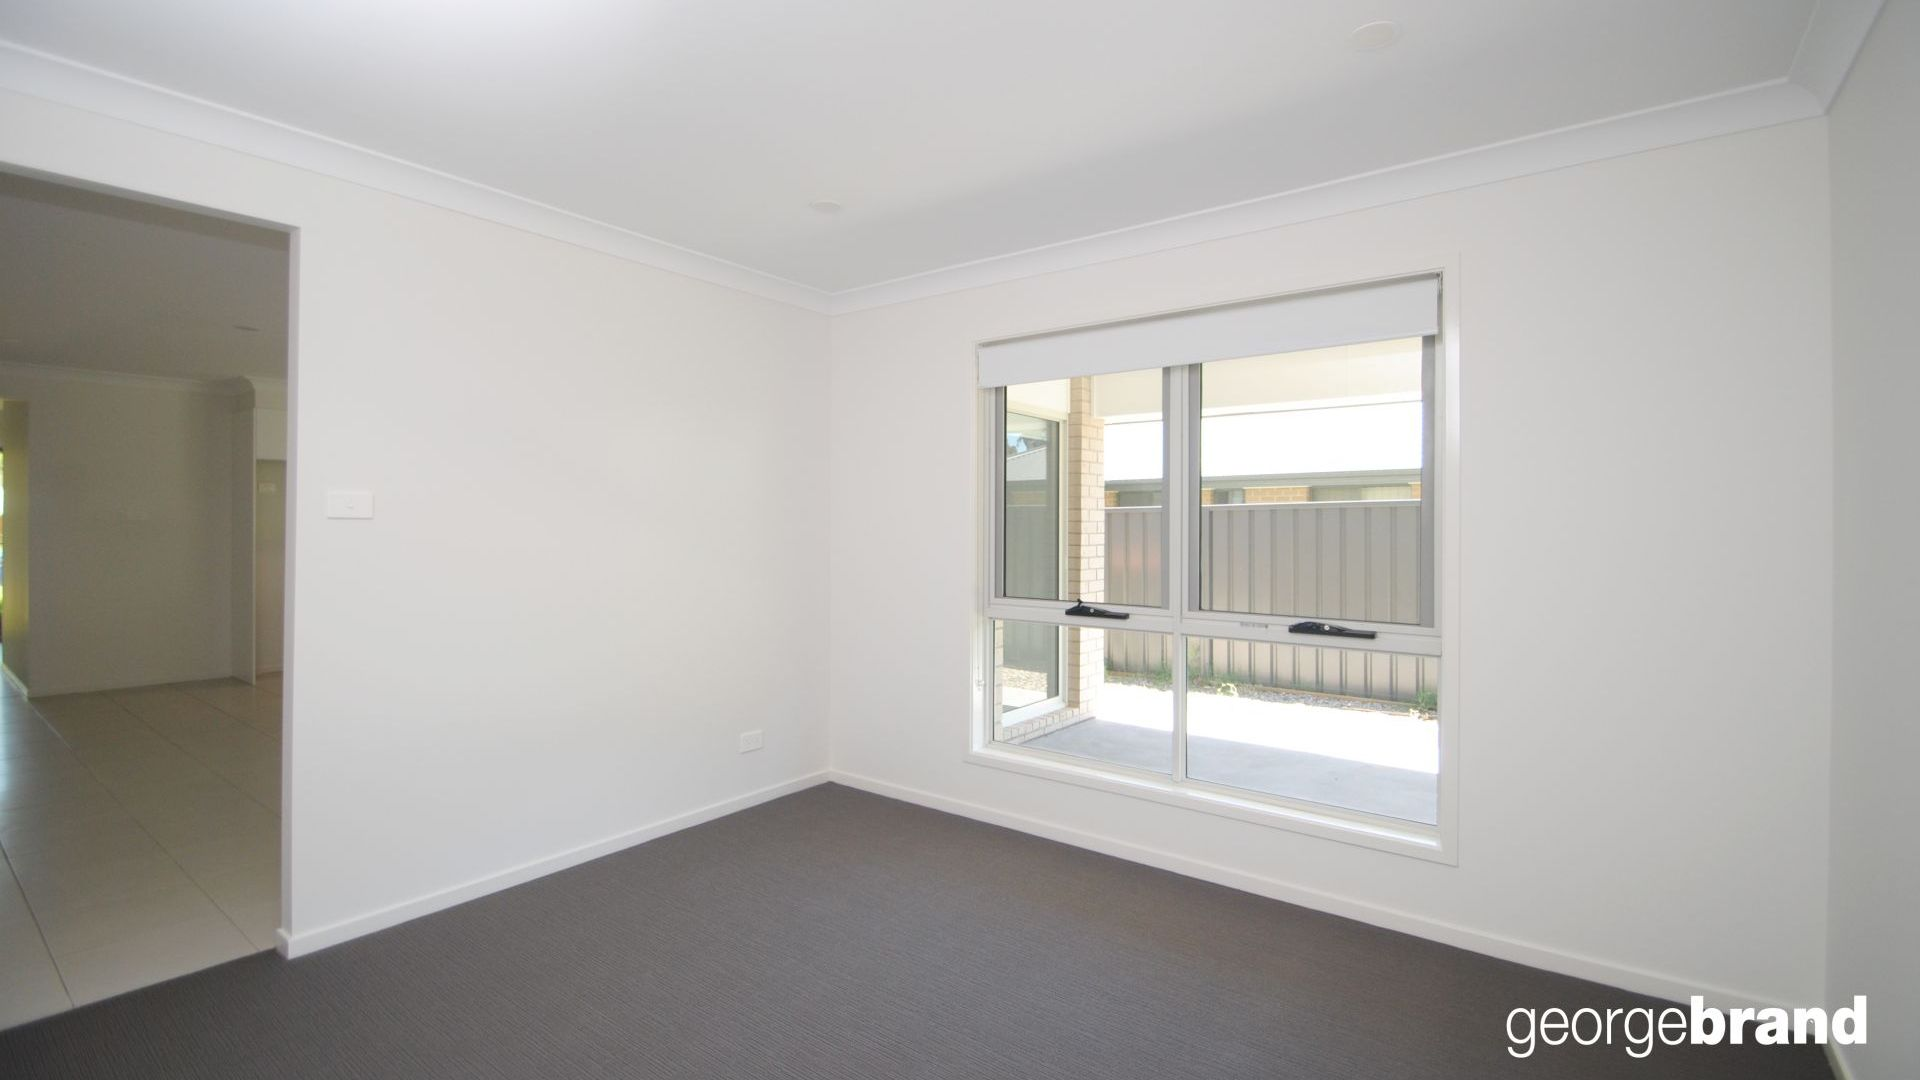 447 Wollombi Rd, Bellbird NSW 2325, Image 1